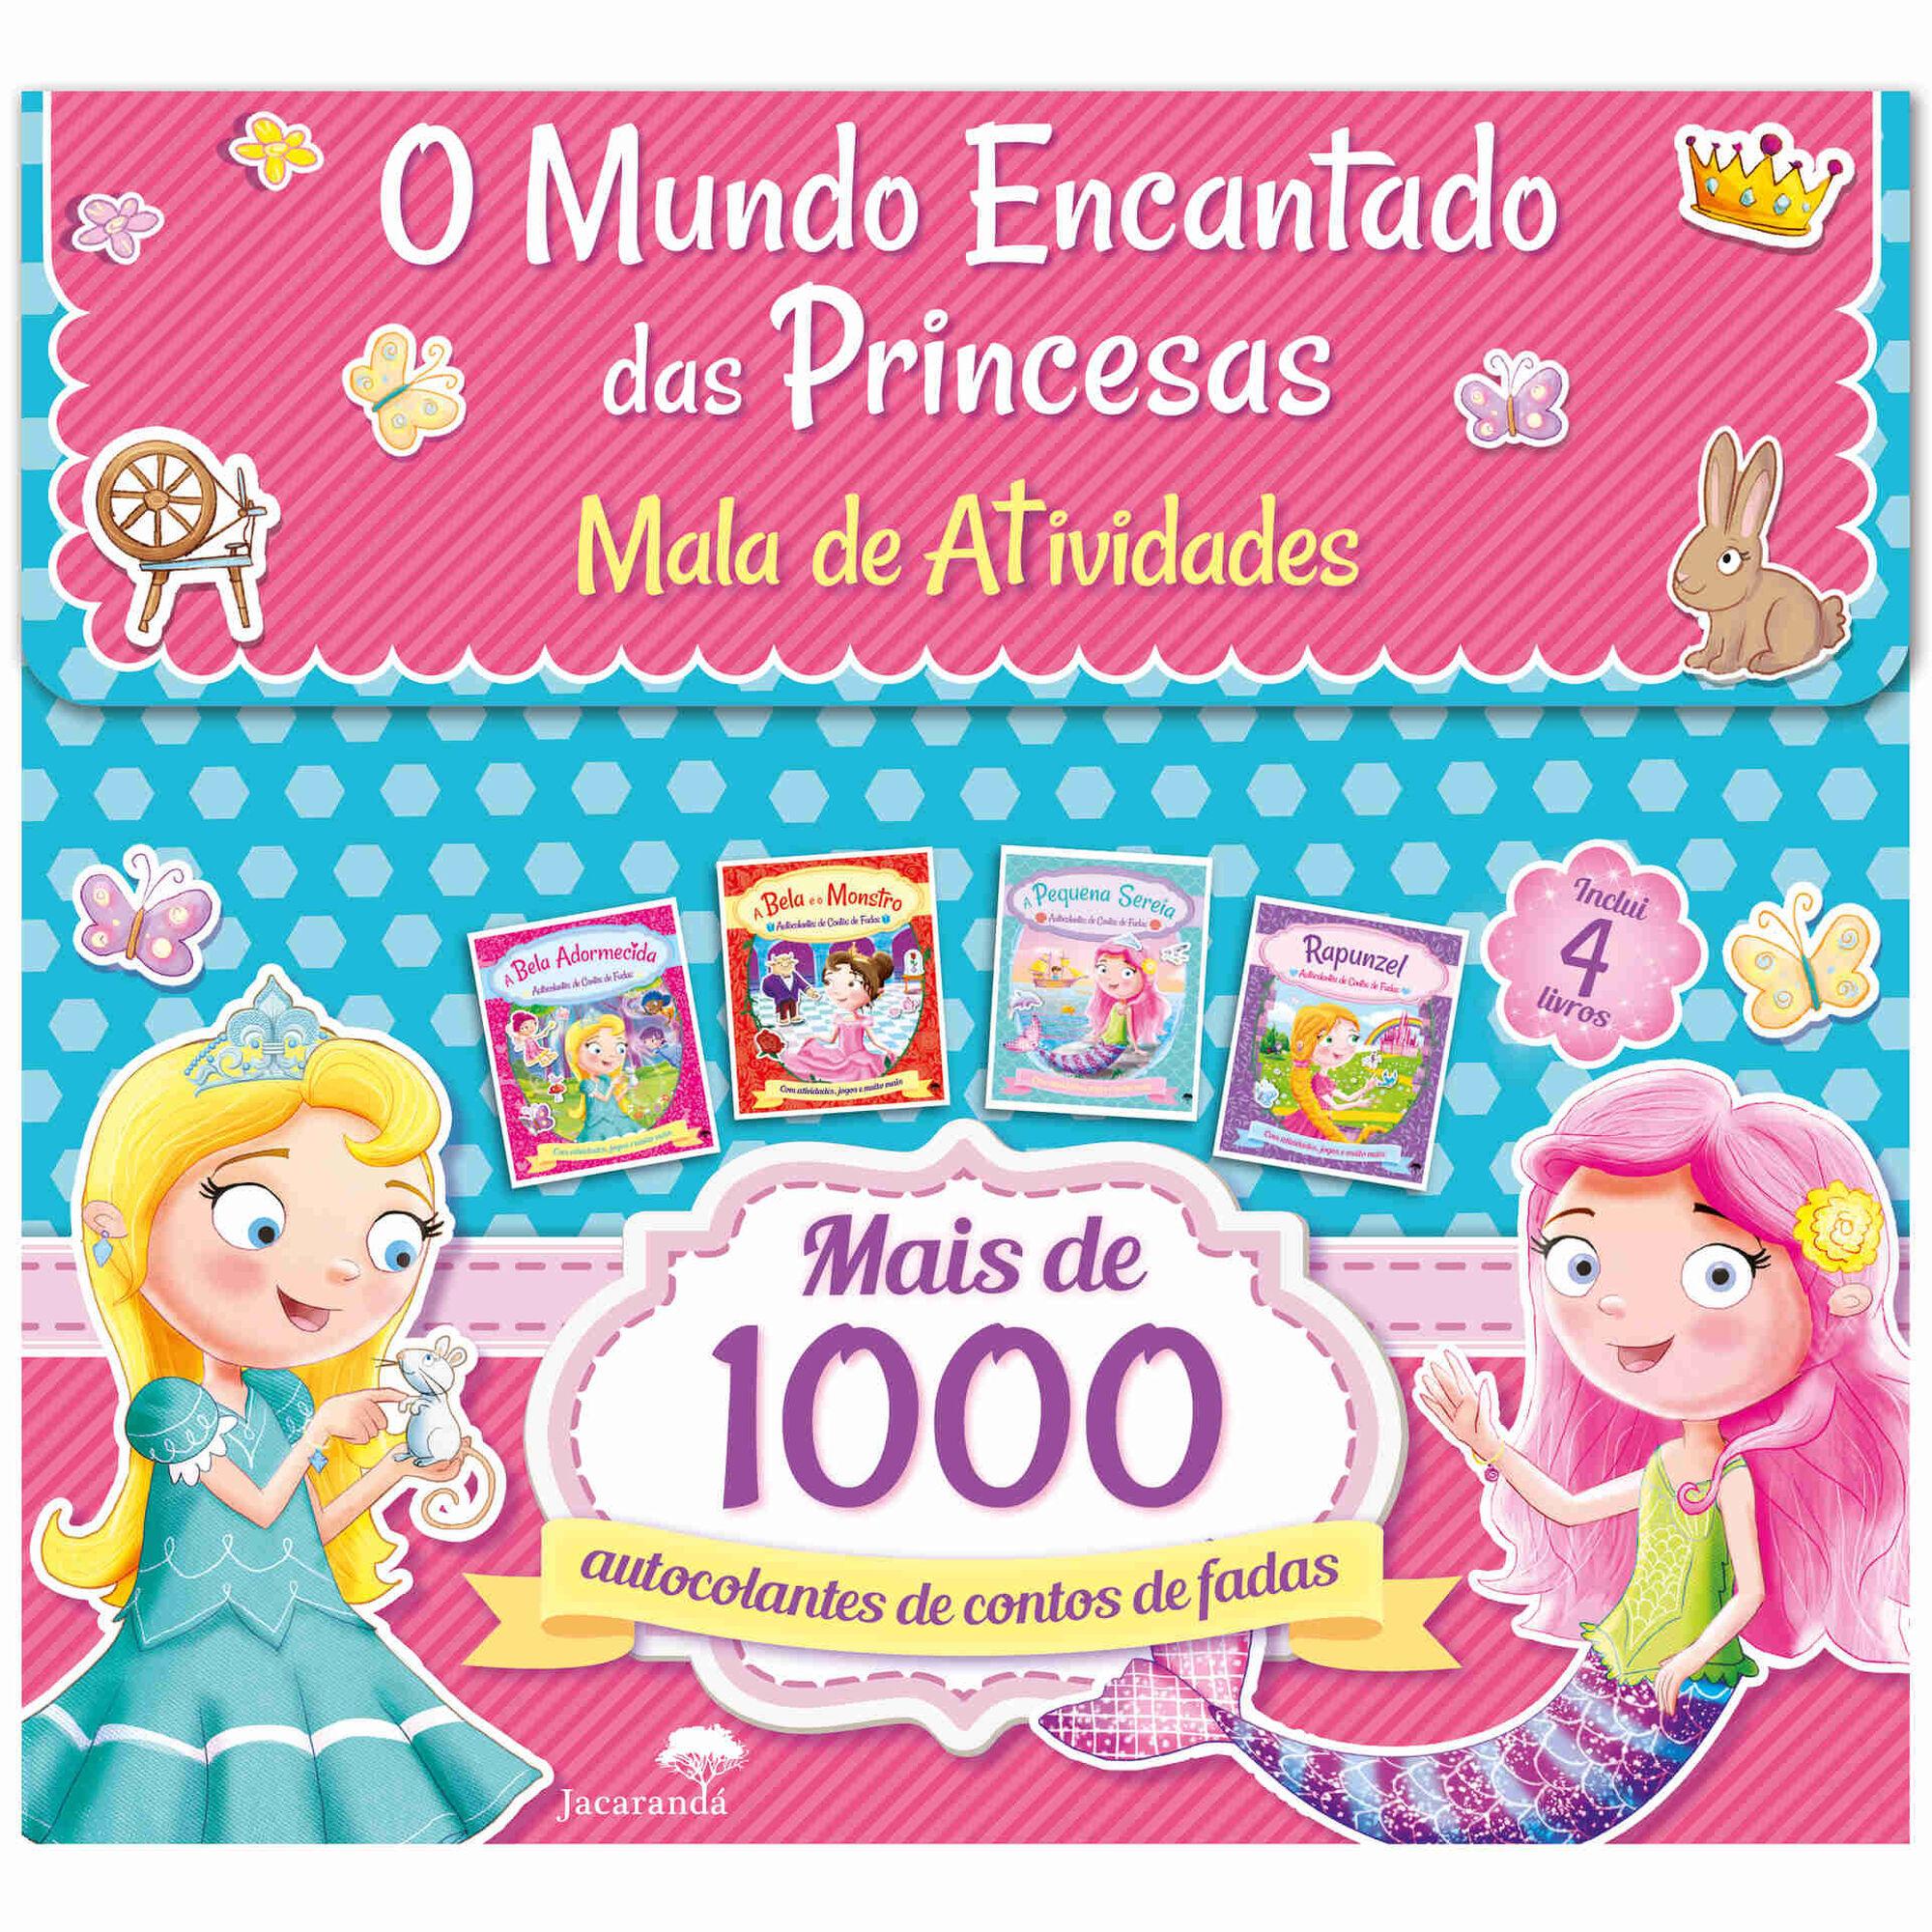 O Mundo Encantado das Princesas - Mala de Atividades